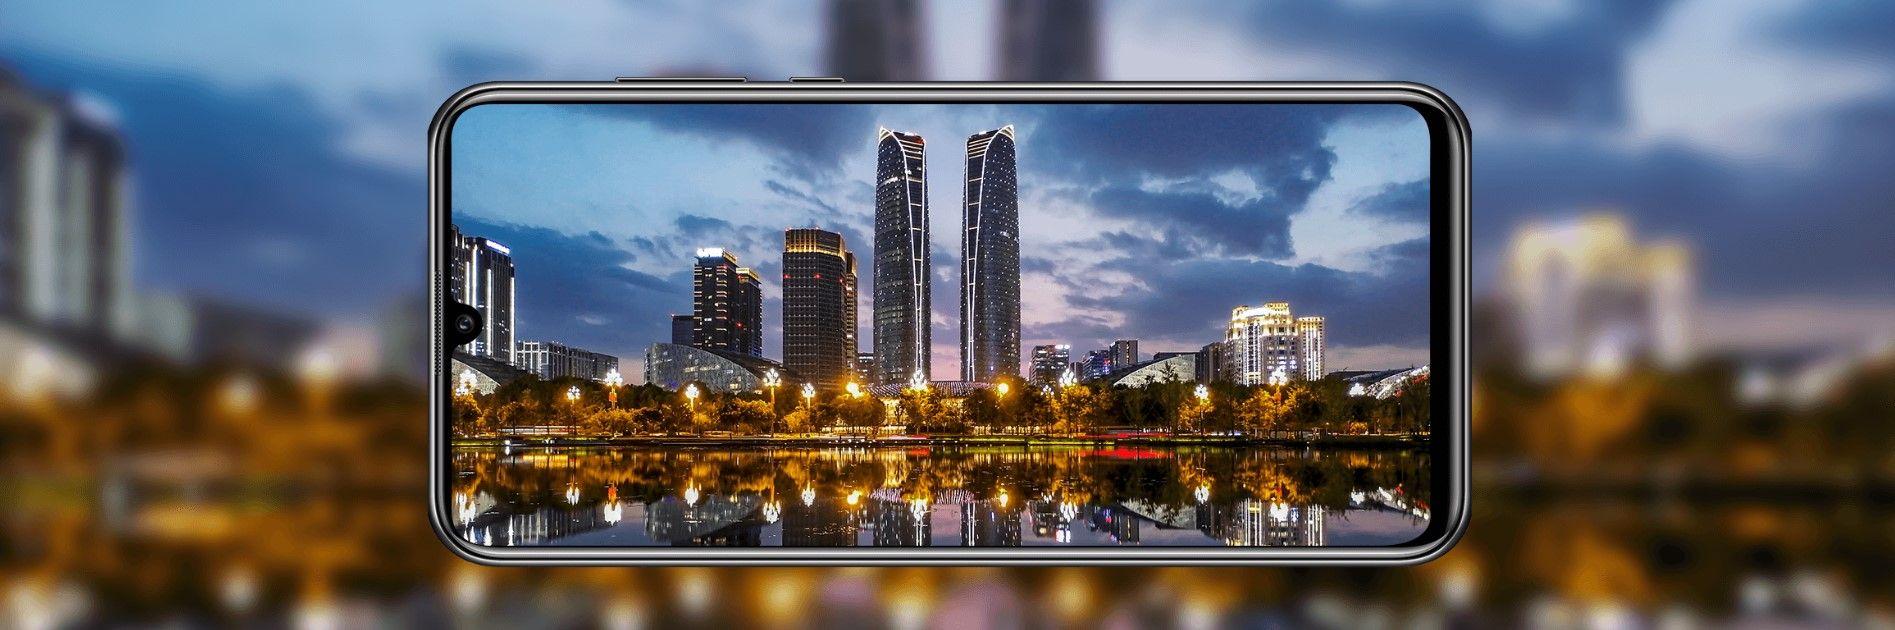 Huawei Y8p ночная съемка